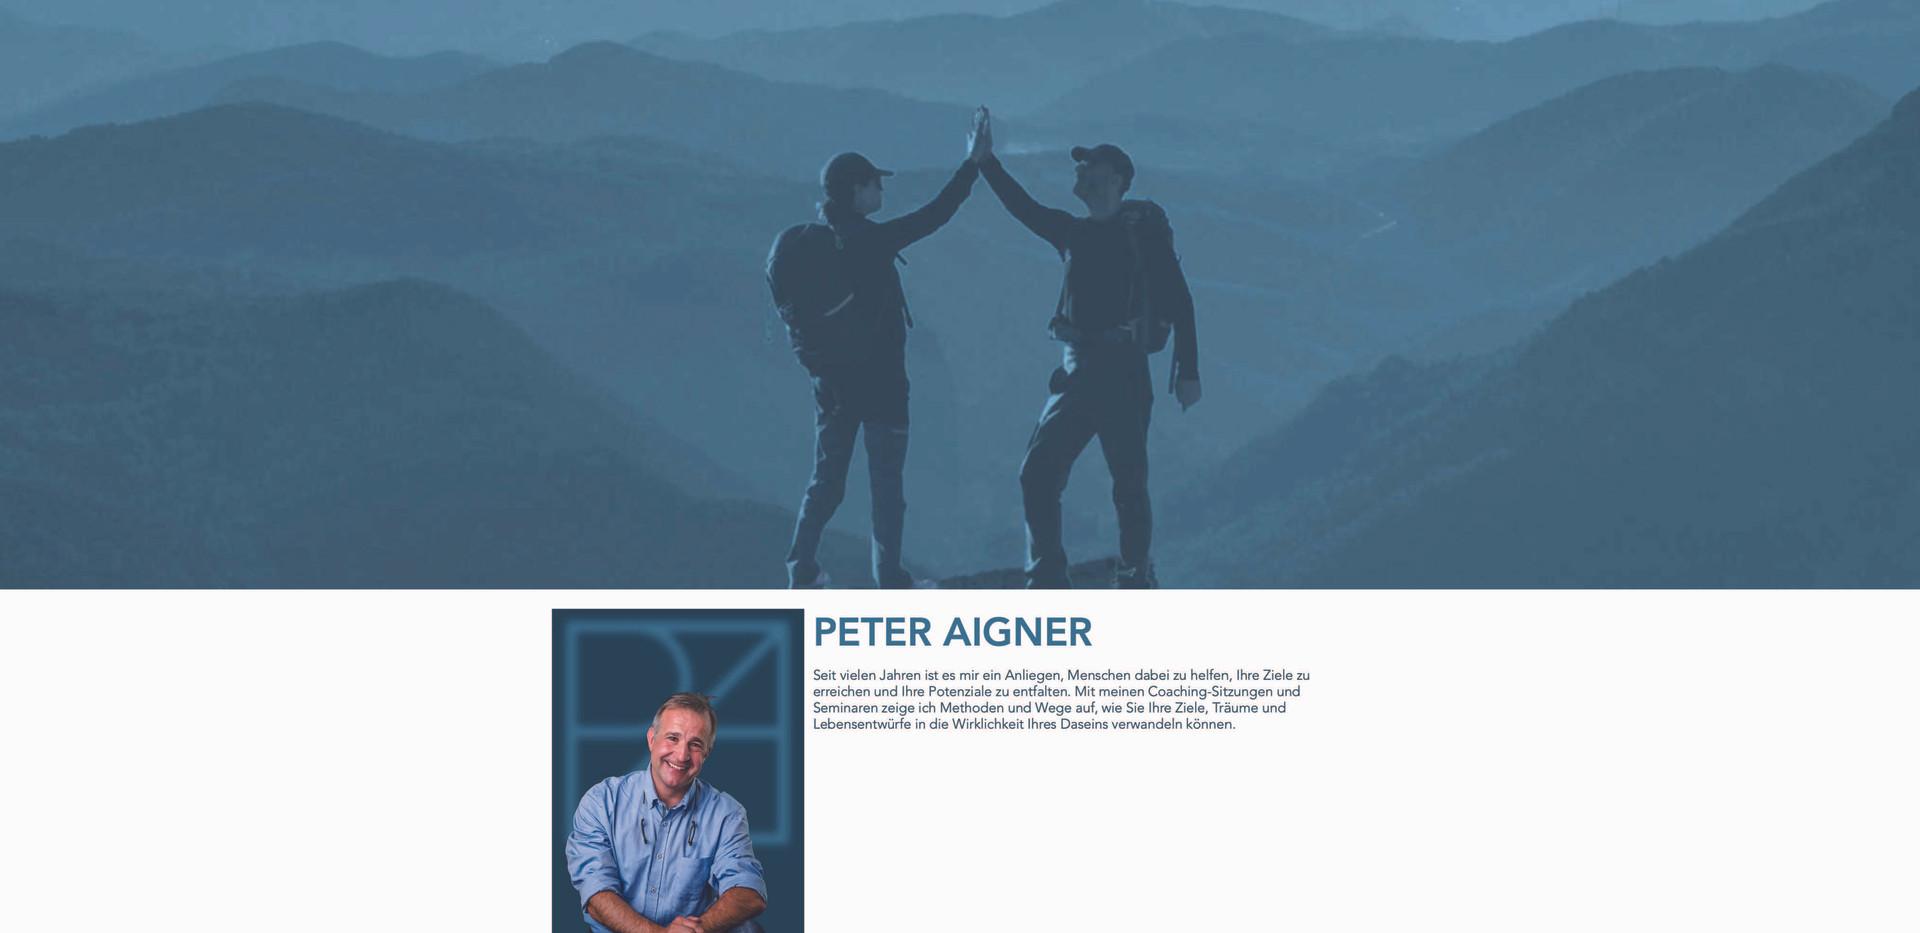 ATELIER_PRAESENTATION_2020_Seite_22.jpg